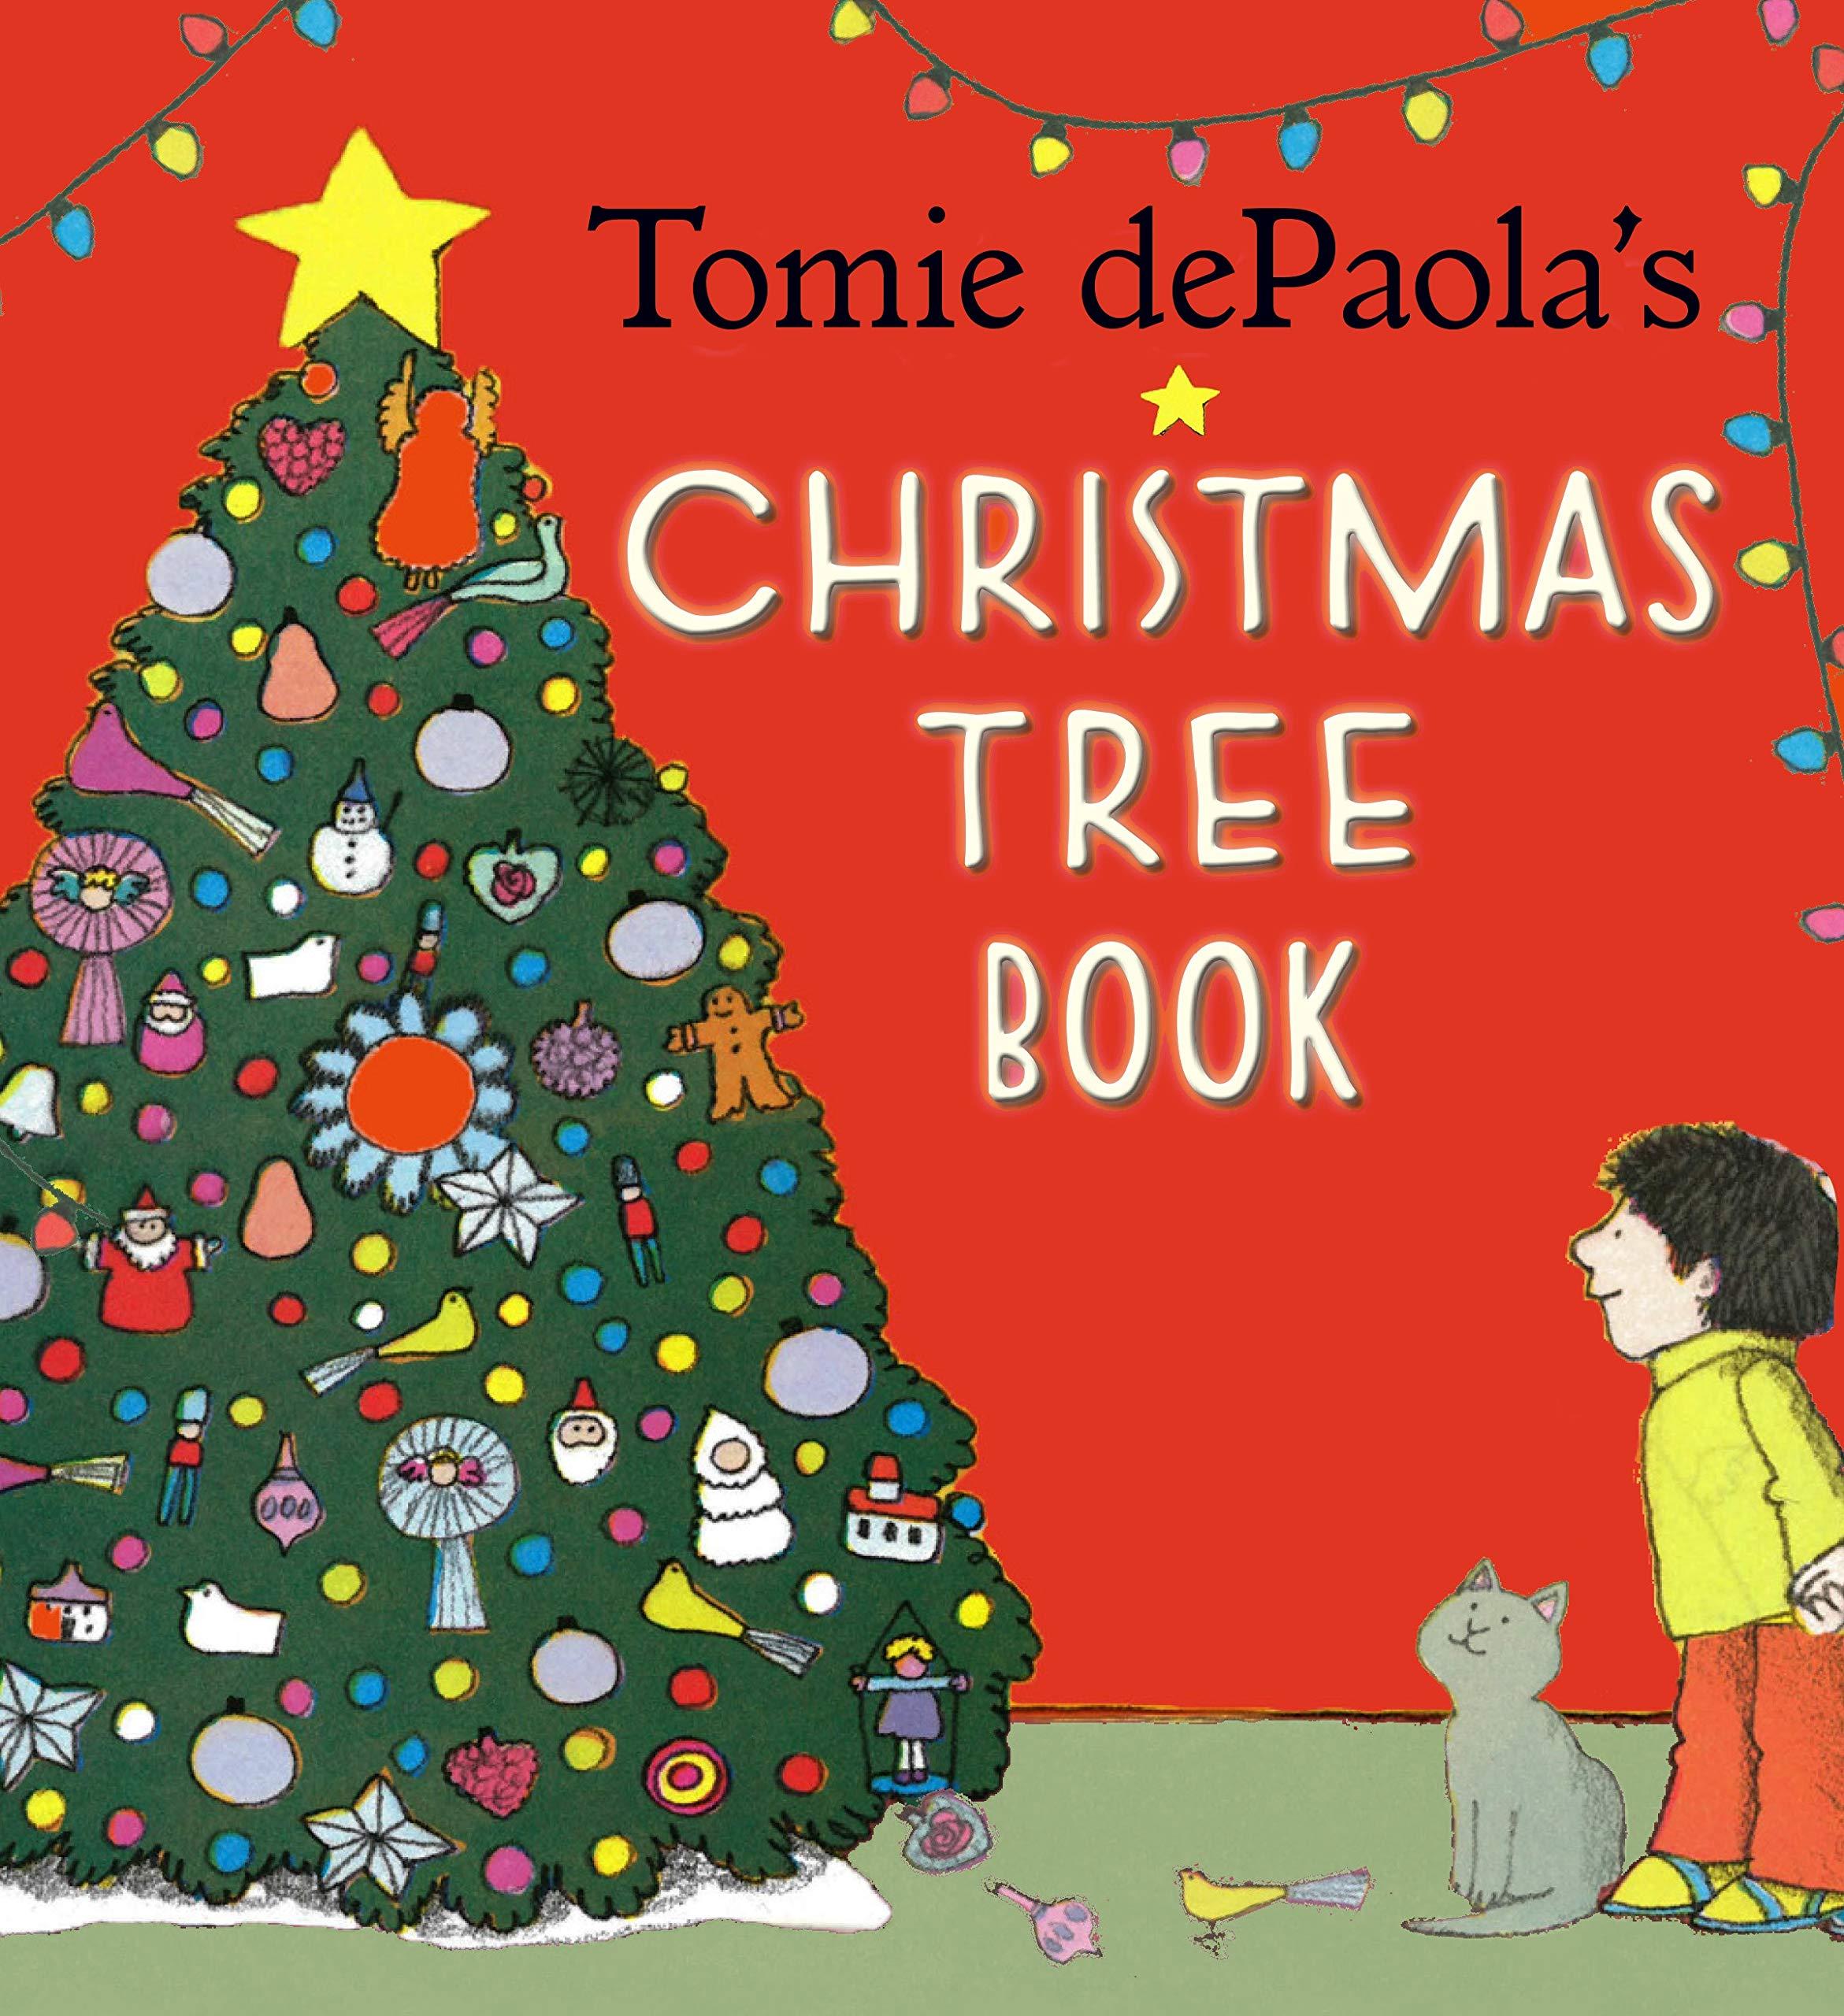 Tomie dePaola's Christmas Tree Book: dePaola, Tomie: 9780823442386: Amazon.com: Books